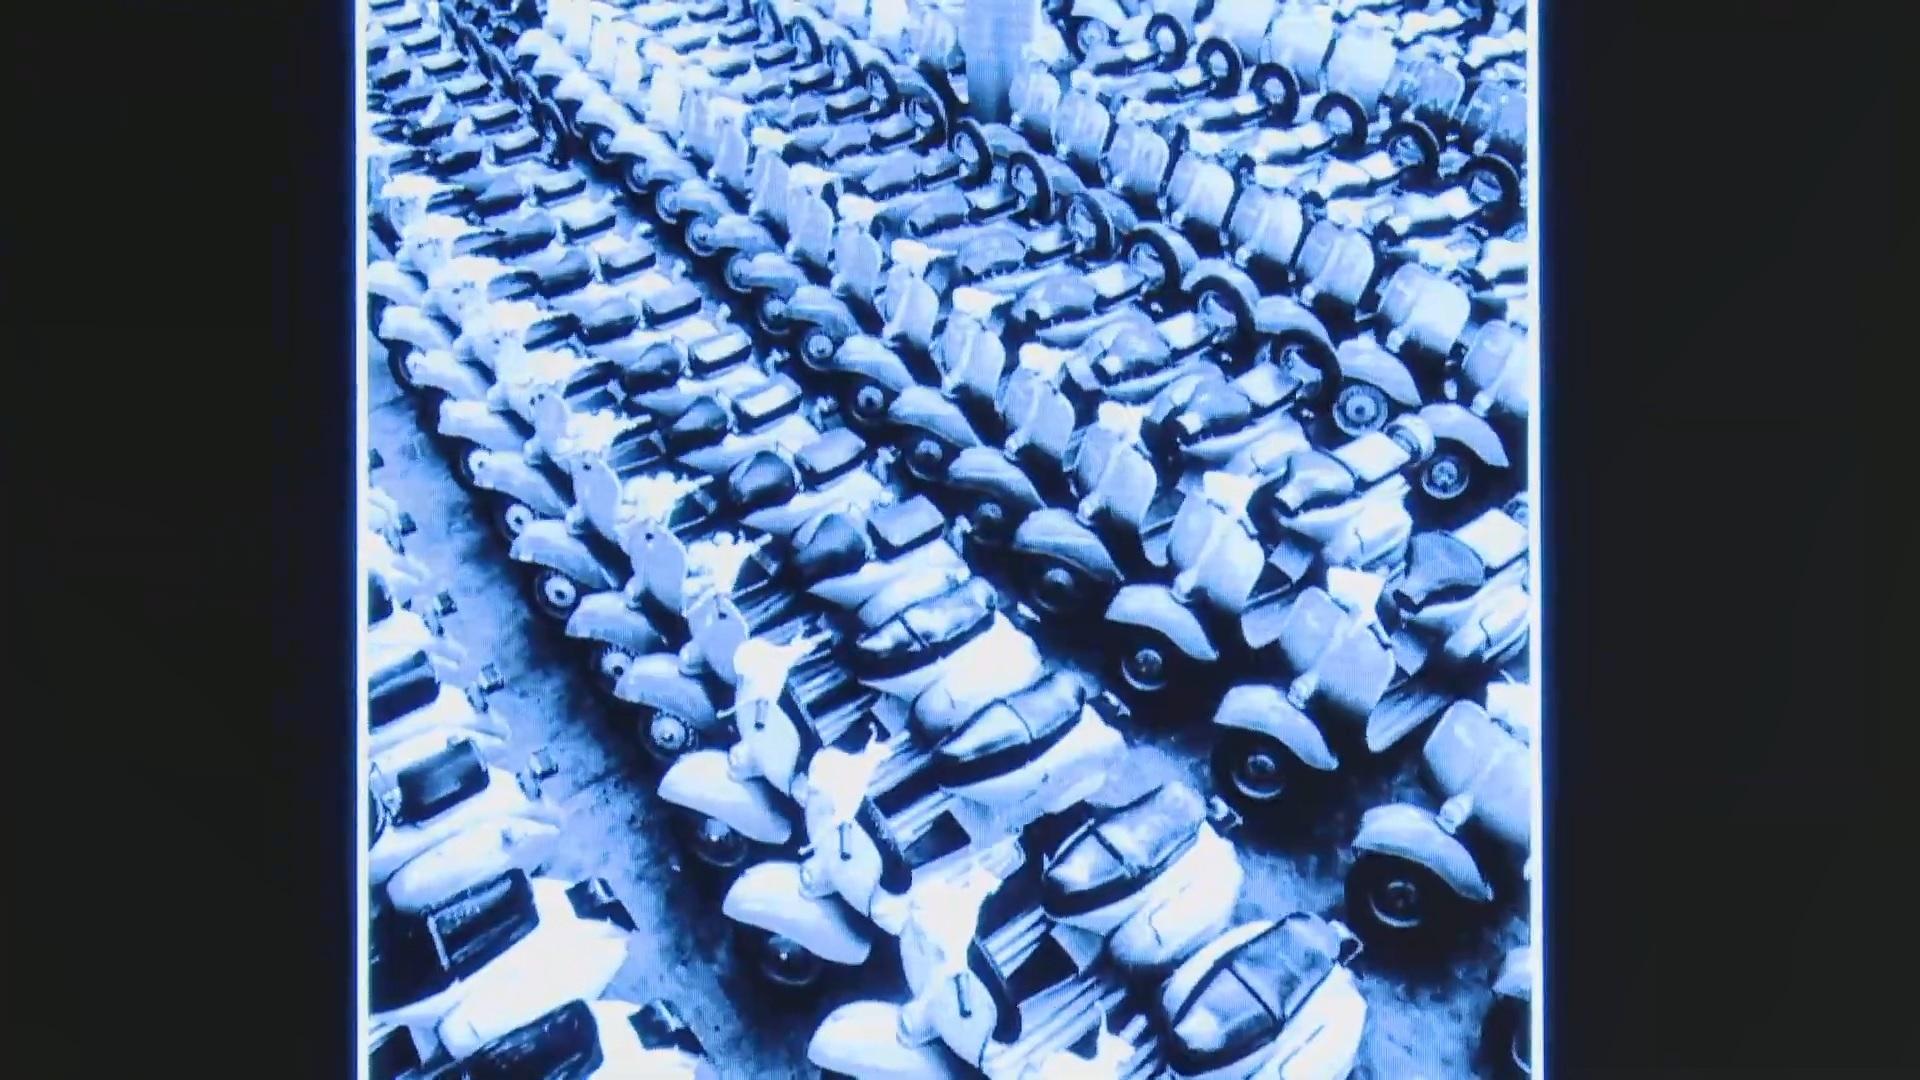 <p>&quot;The Golden Era, Humara Bajaj&quot; -&nbsp;Rajiv Bajaj, MD of Bajaj Auto</p>